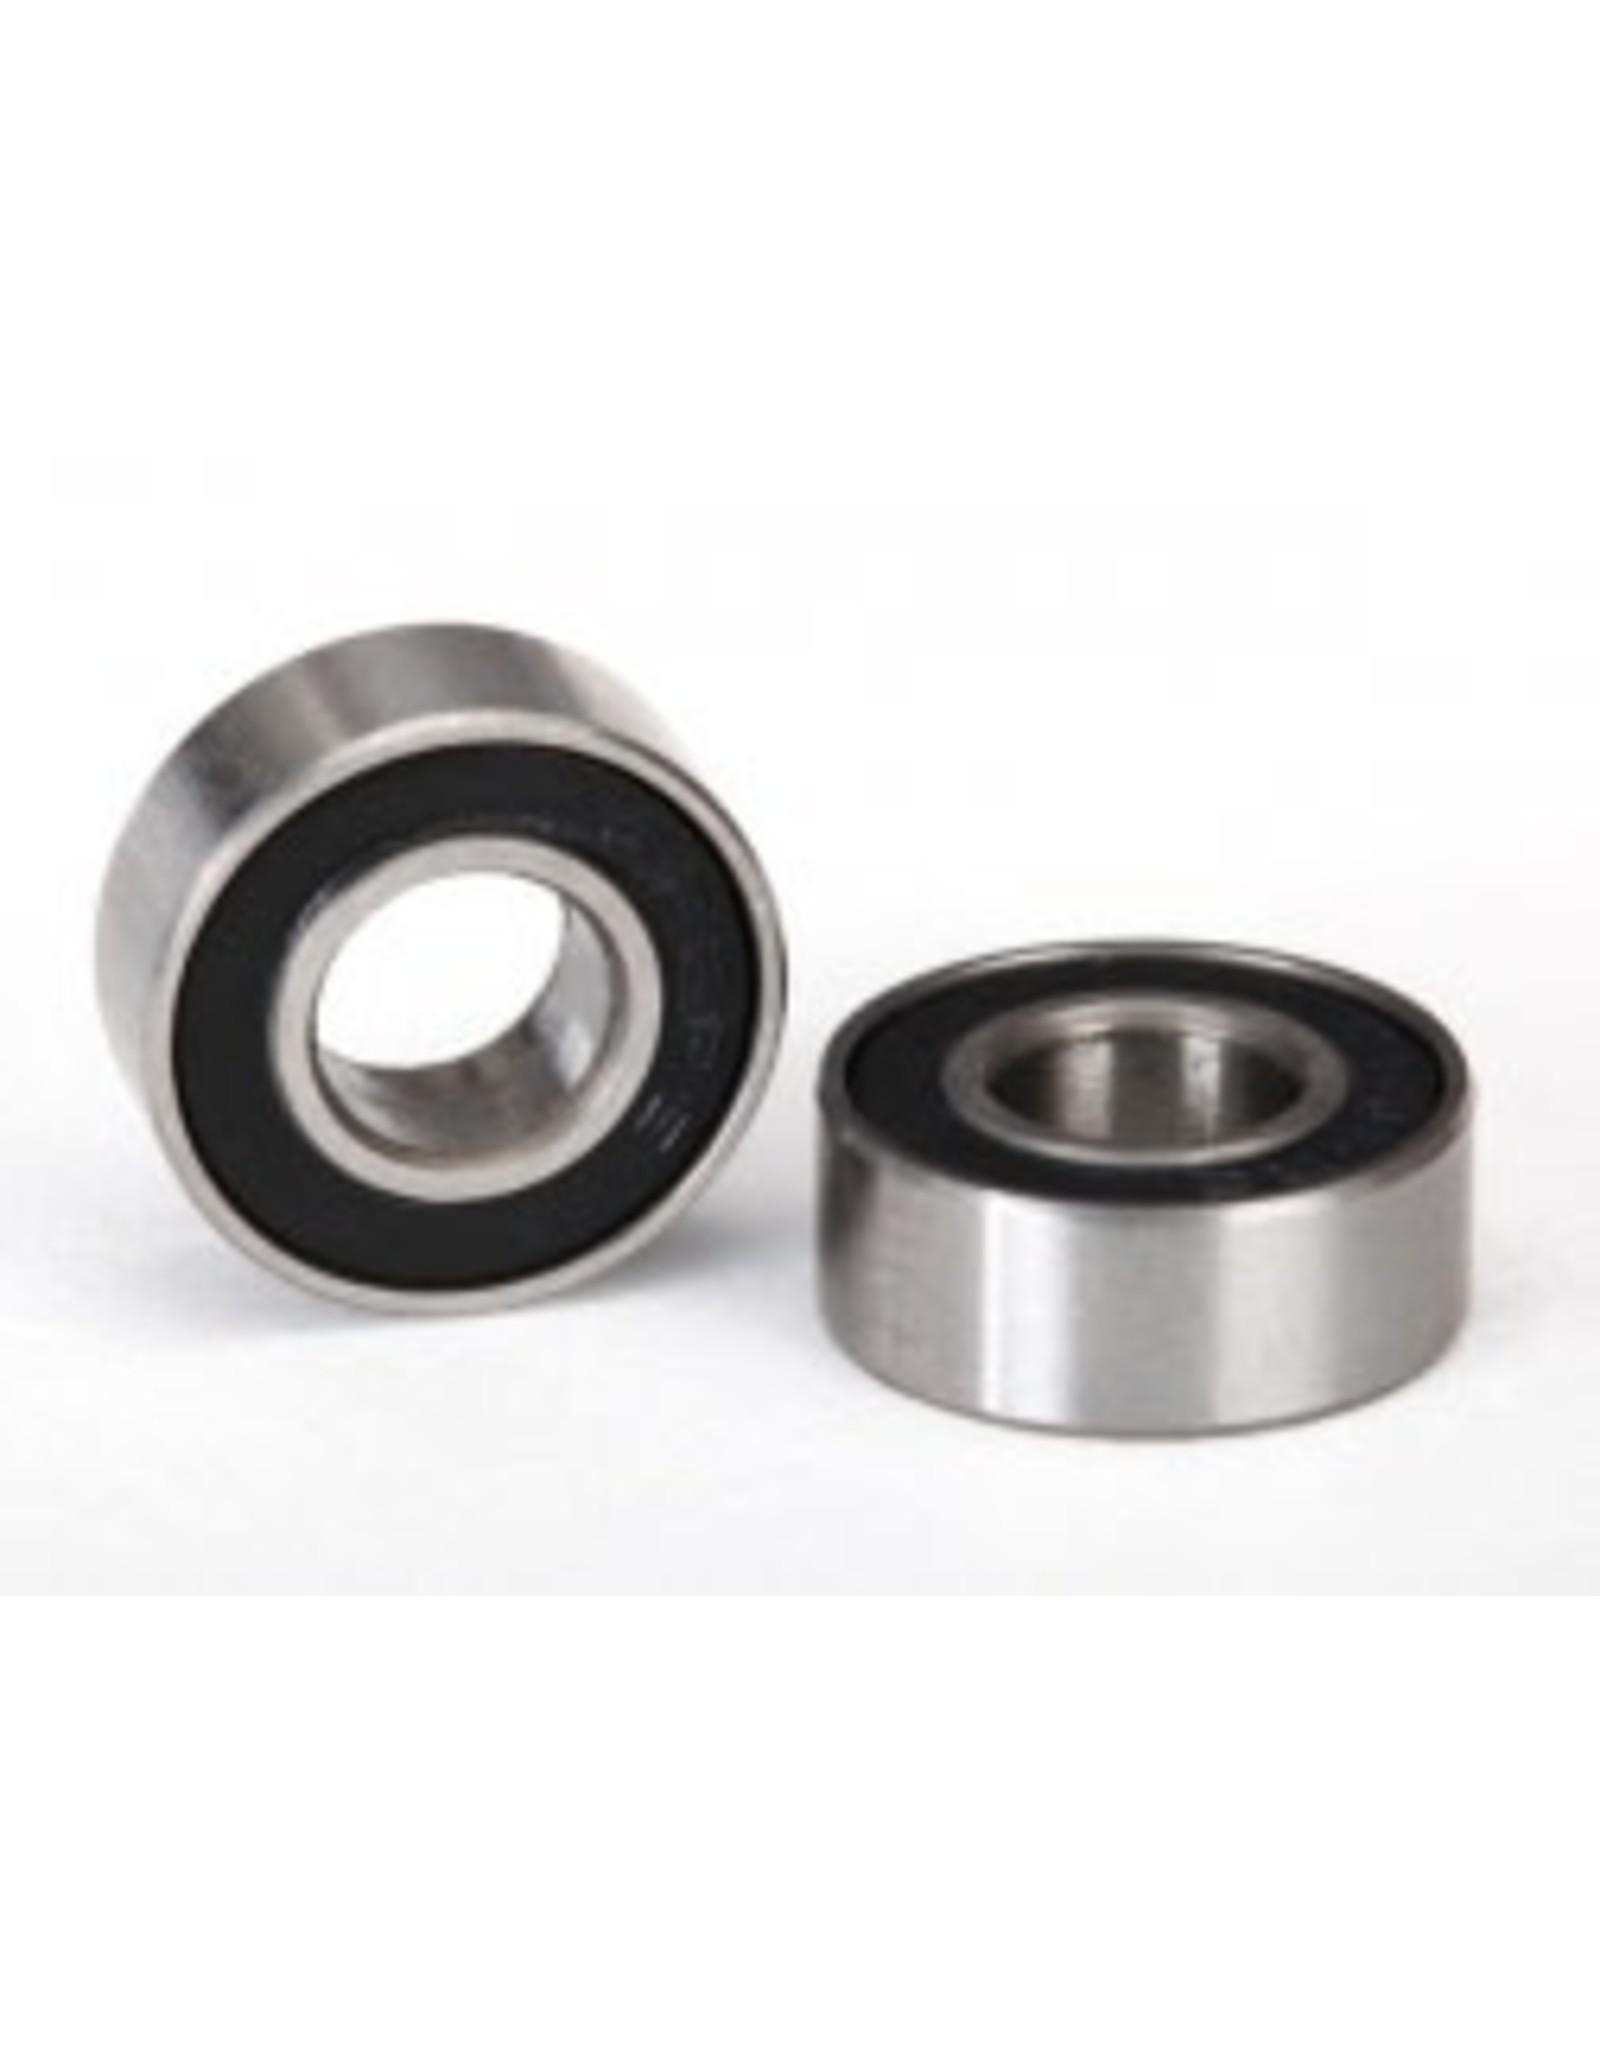 Traxxas Ball Bearings black rubber sealed 5180A